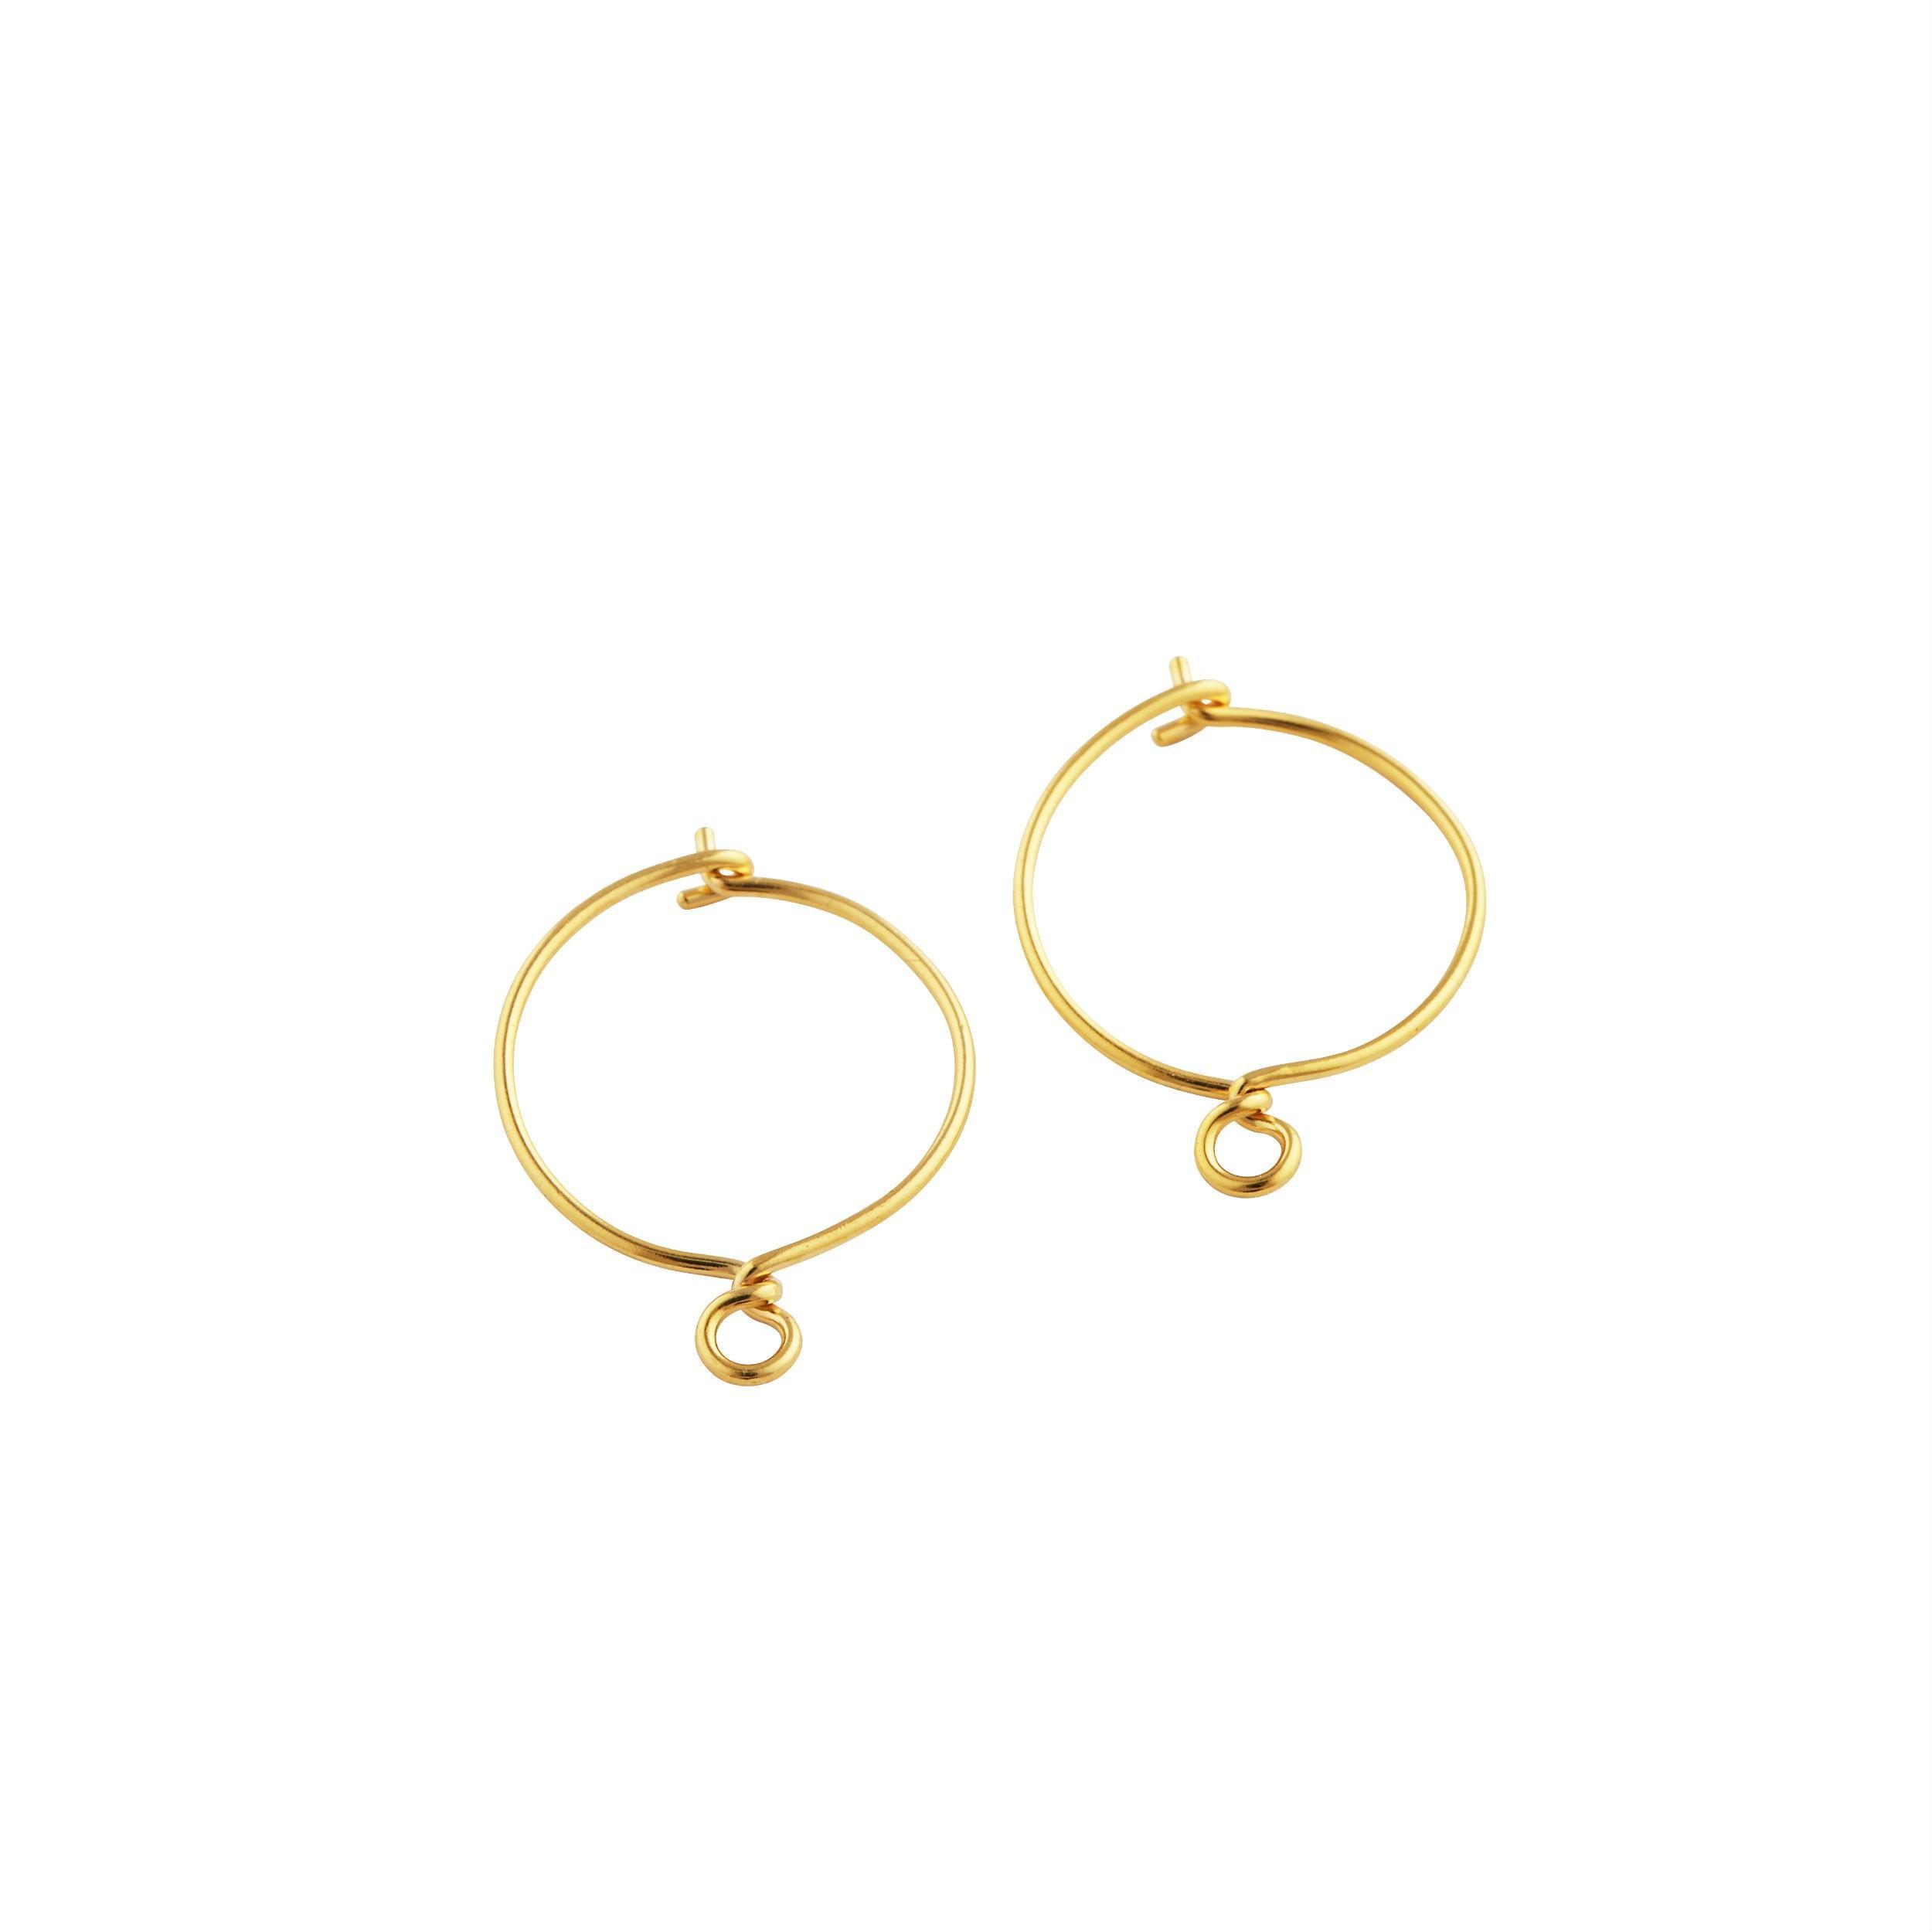 Dianna Earrings Forgyldt-20